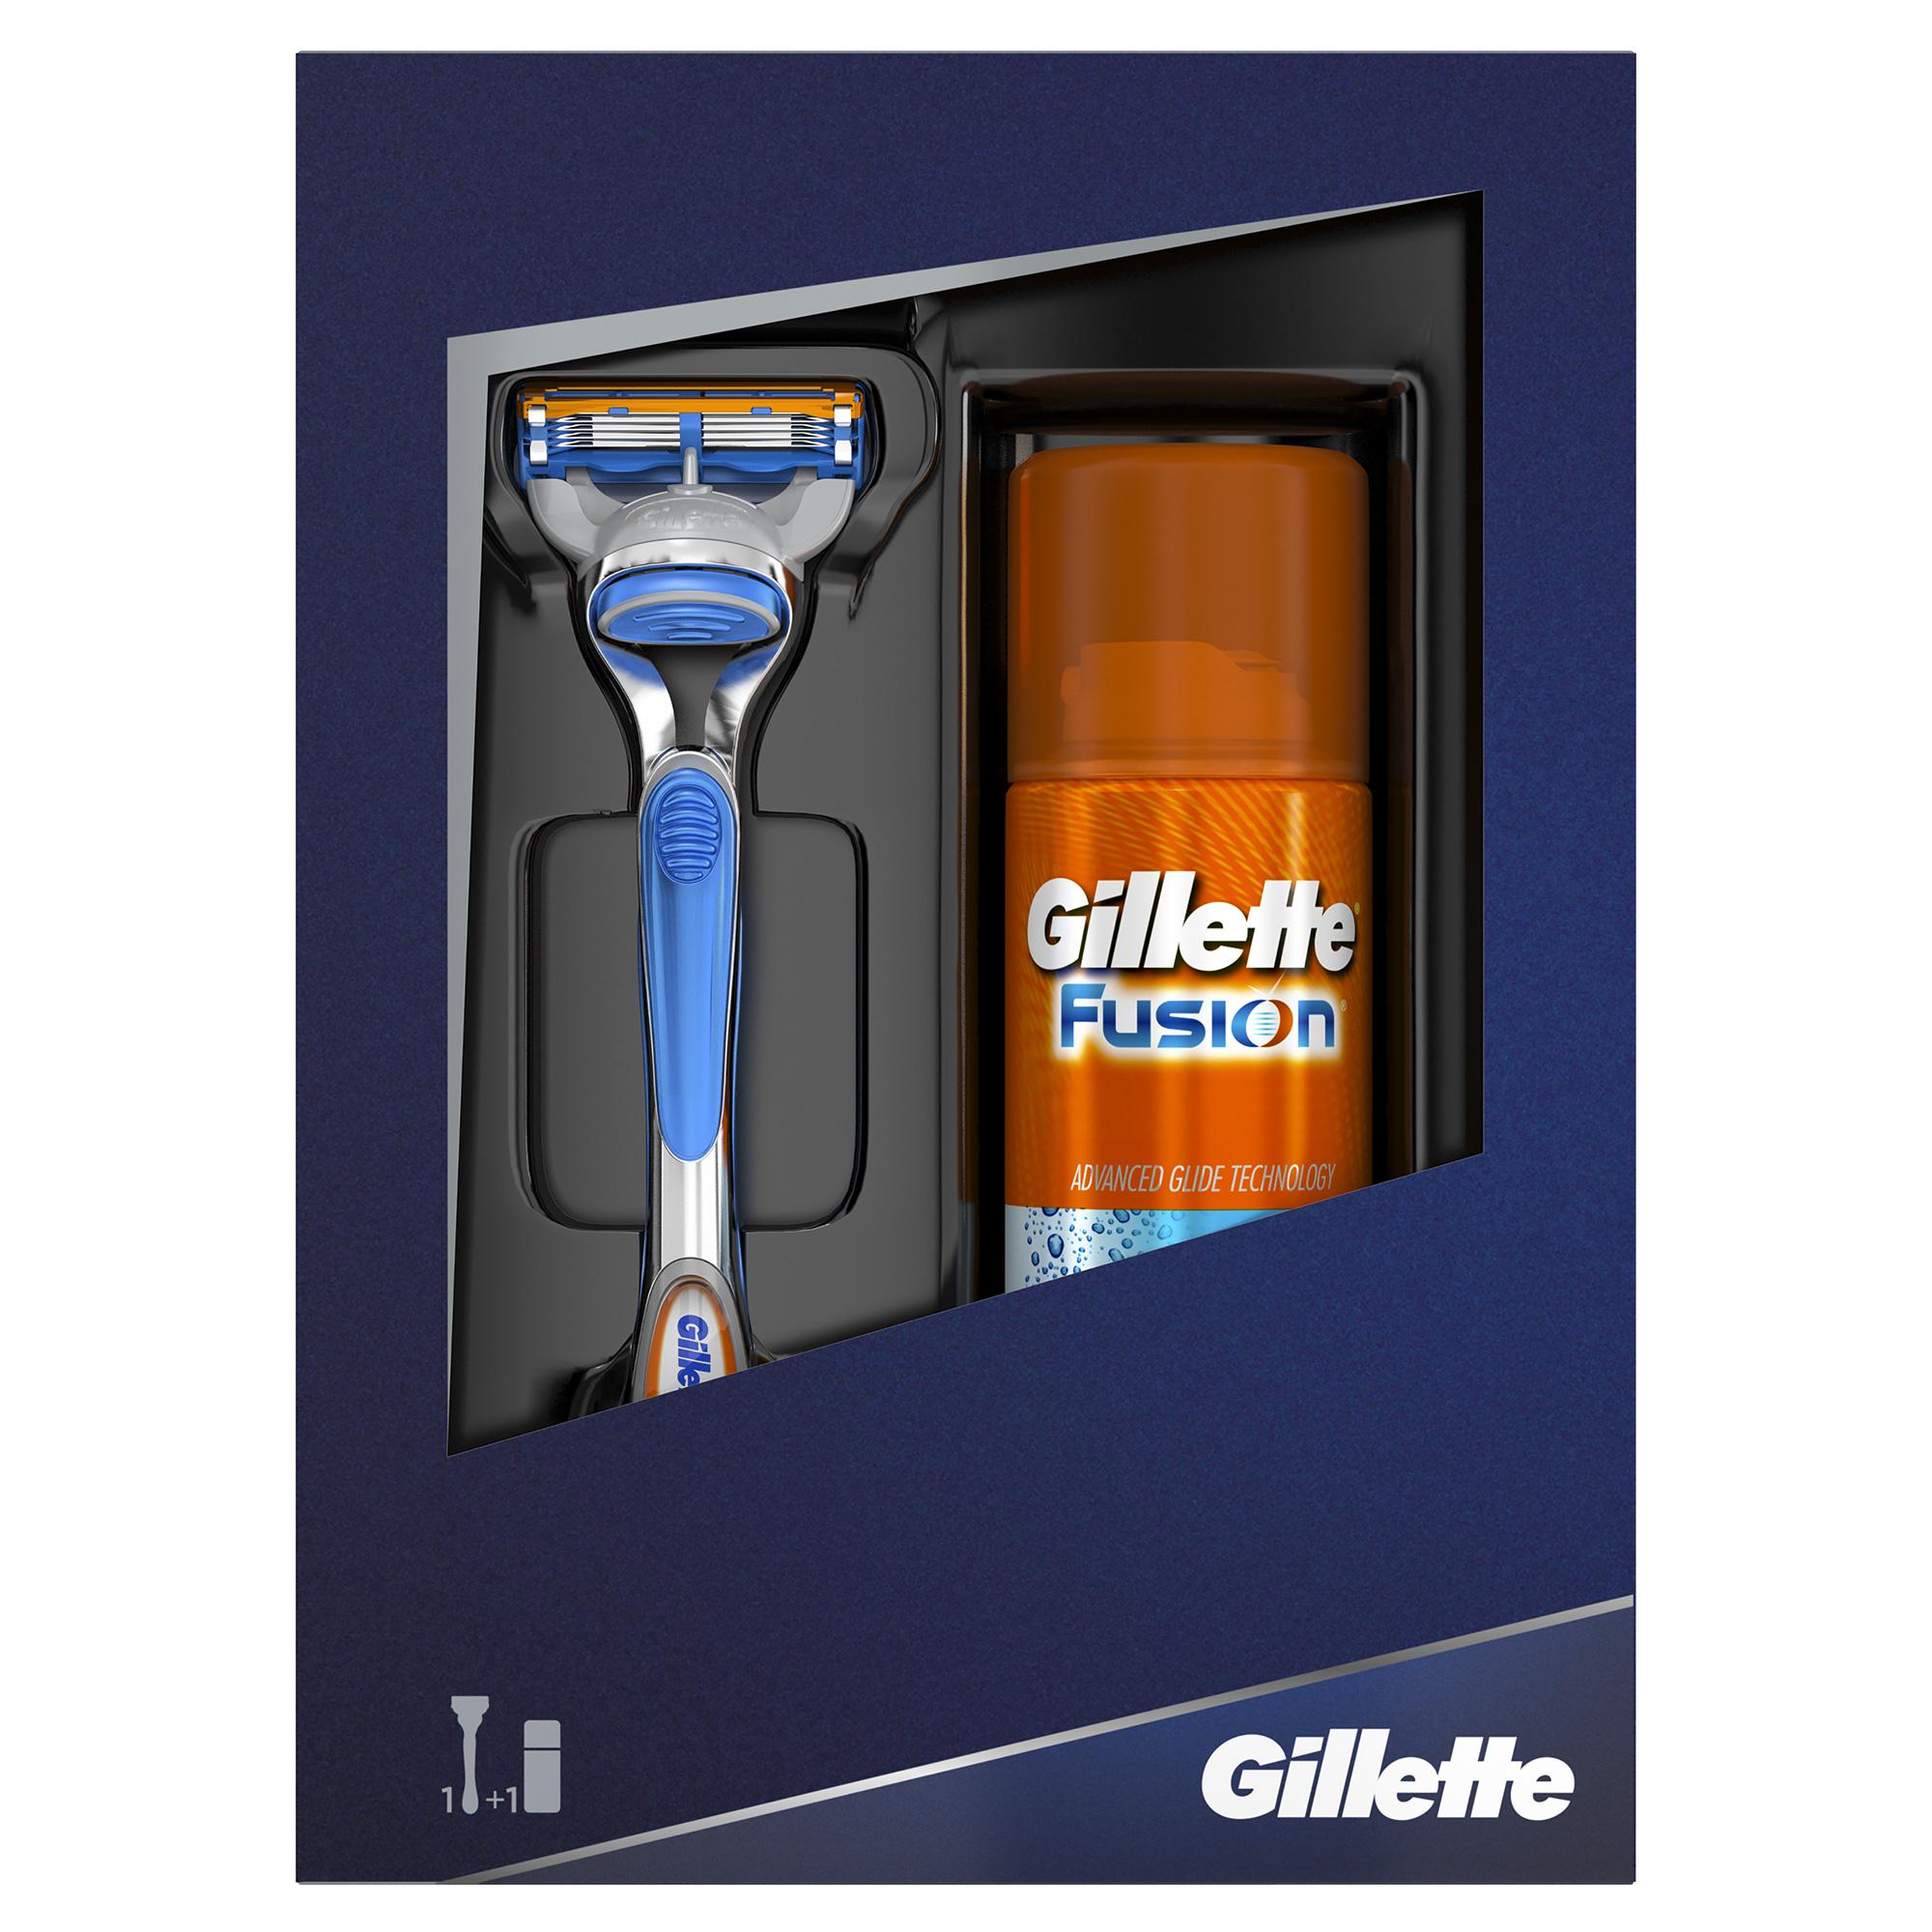 Подарочный набор Gillette Fusion: Мужская Бритва Gillette Fusion + Гель для бритья Gillette Fusion Hydra gel увлажняющий, 75 мл